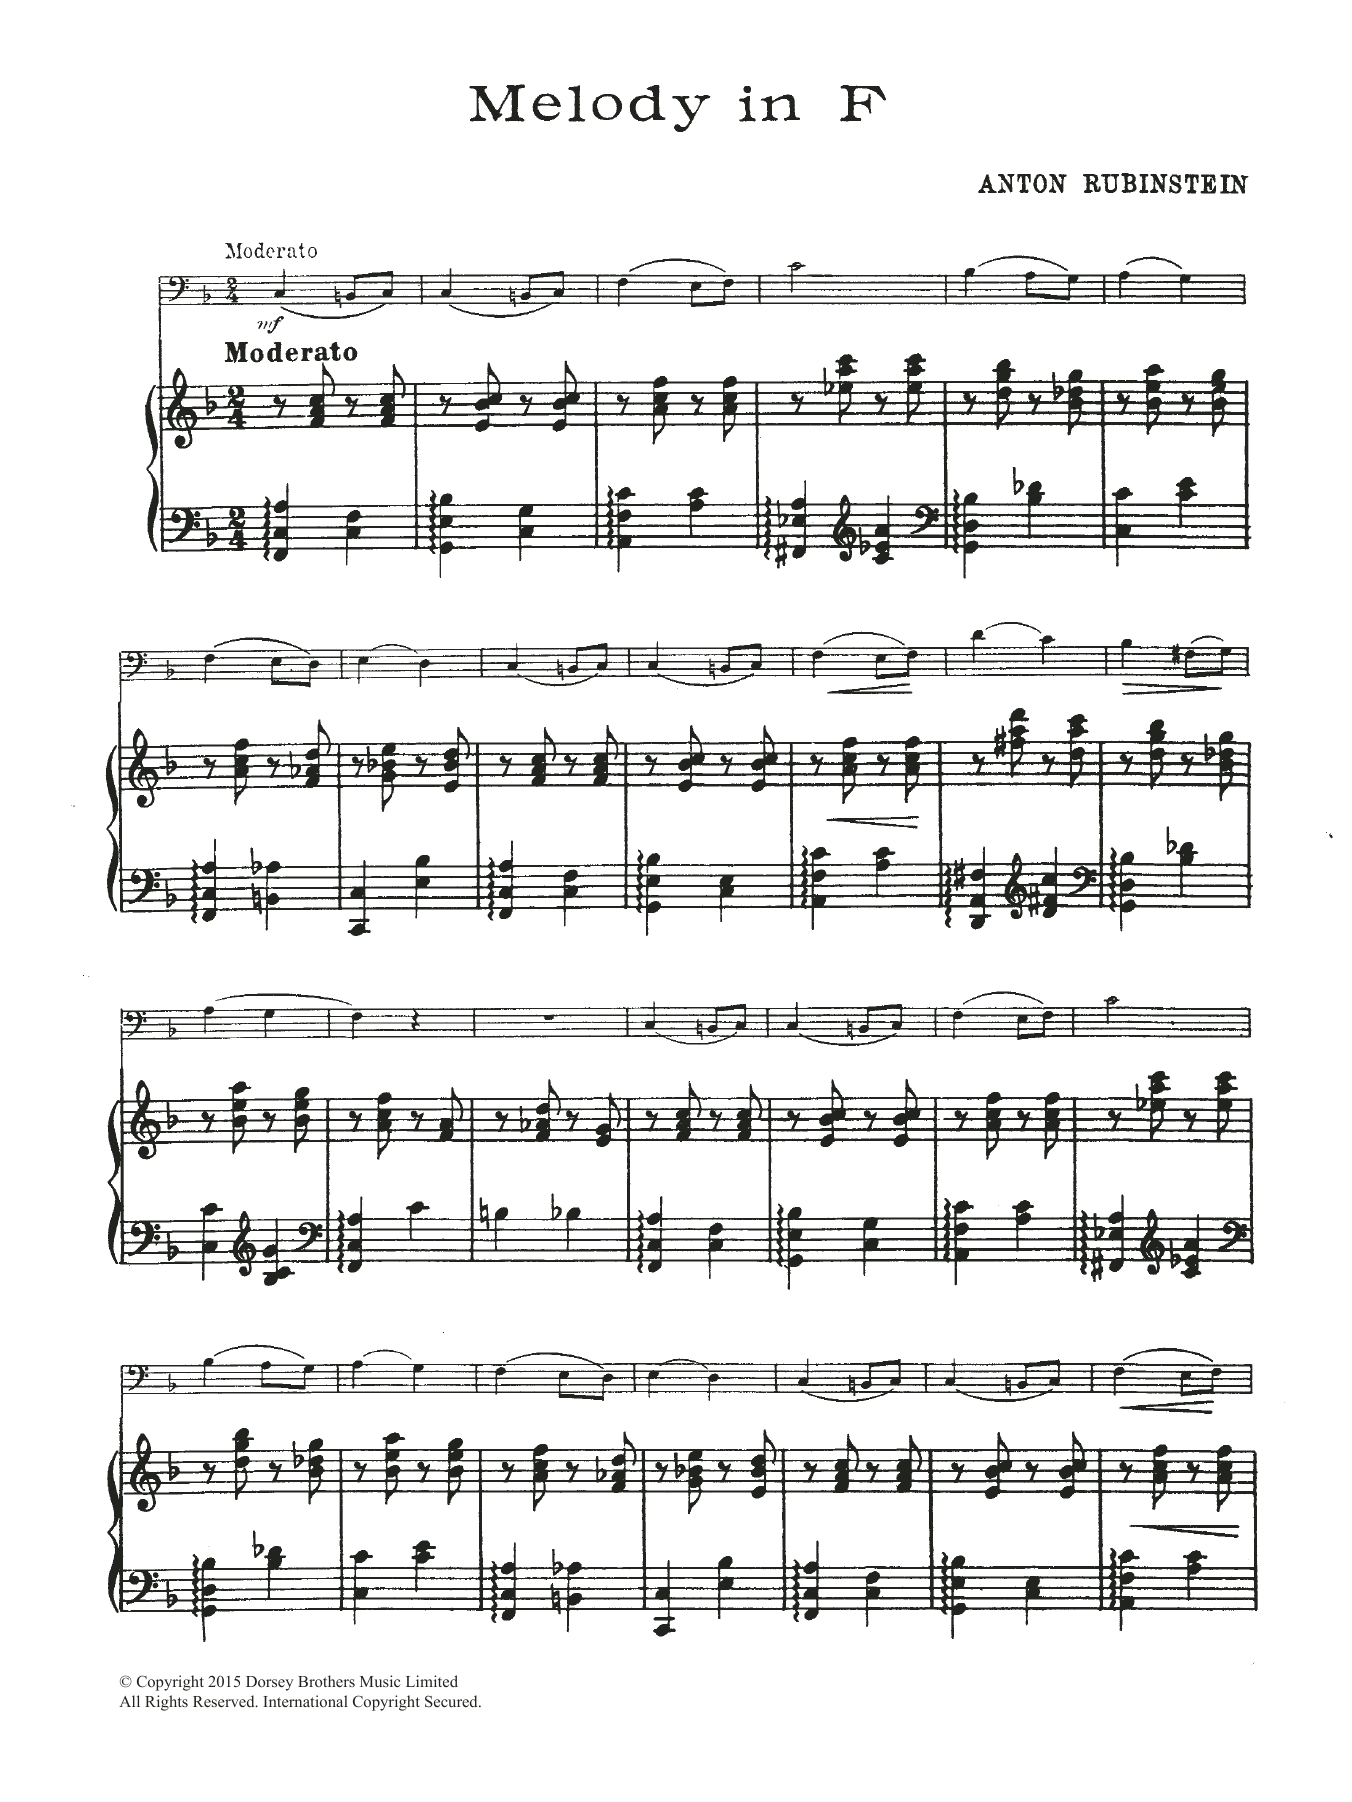 Anton Rubinstein: Melody In F